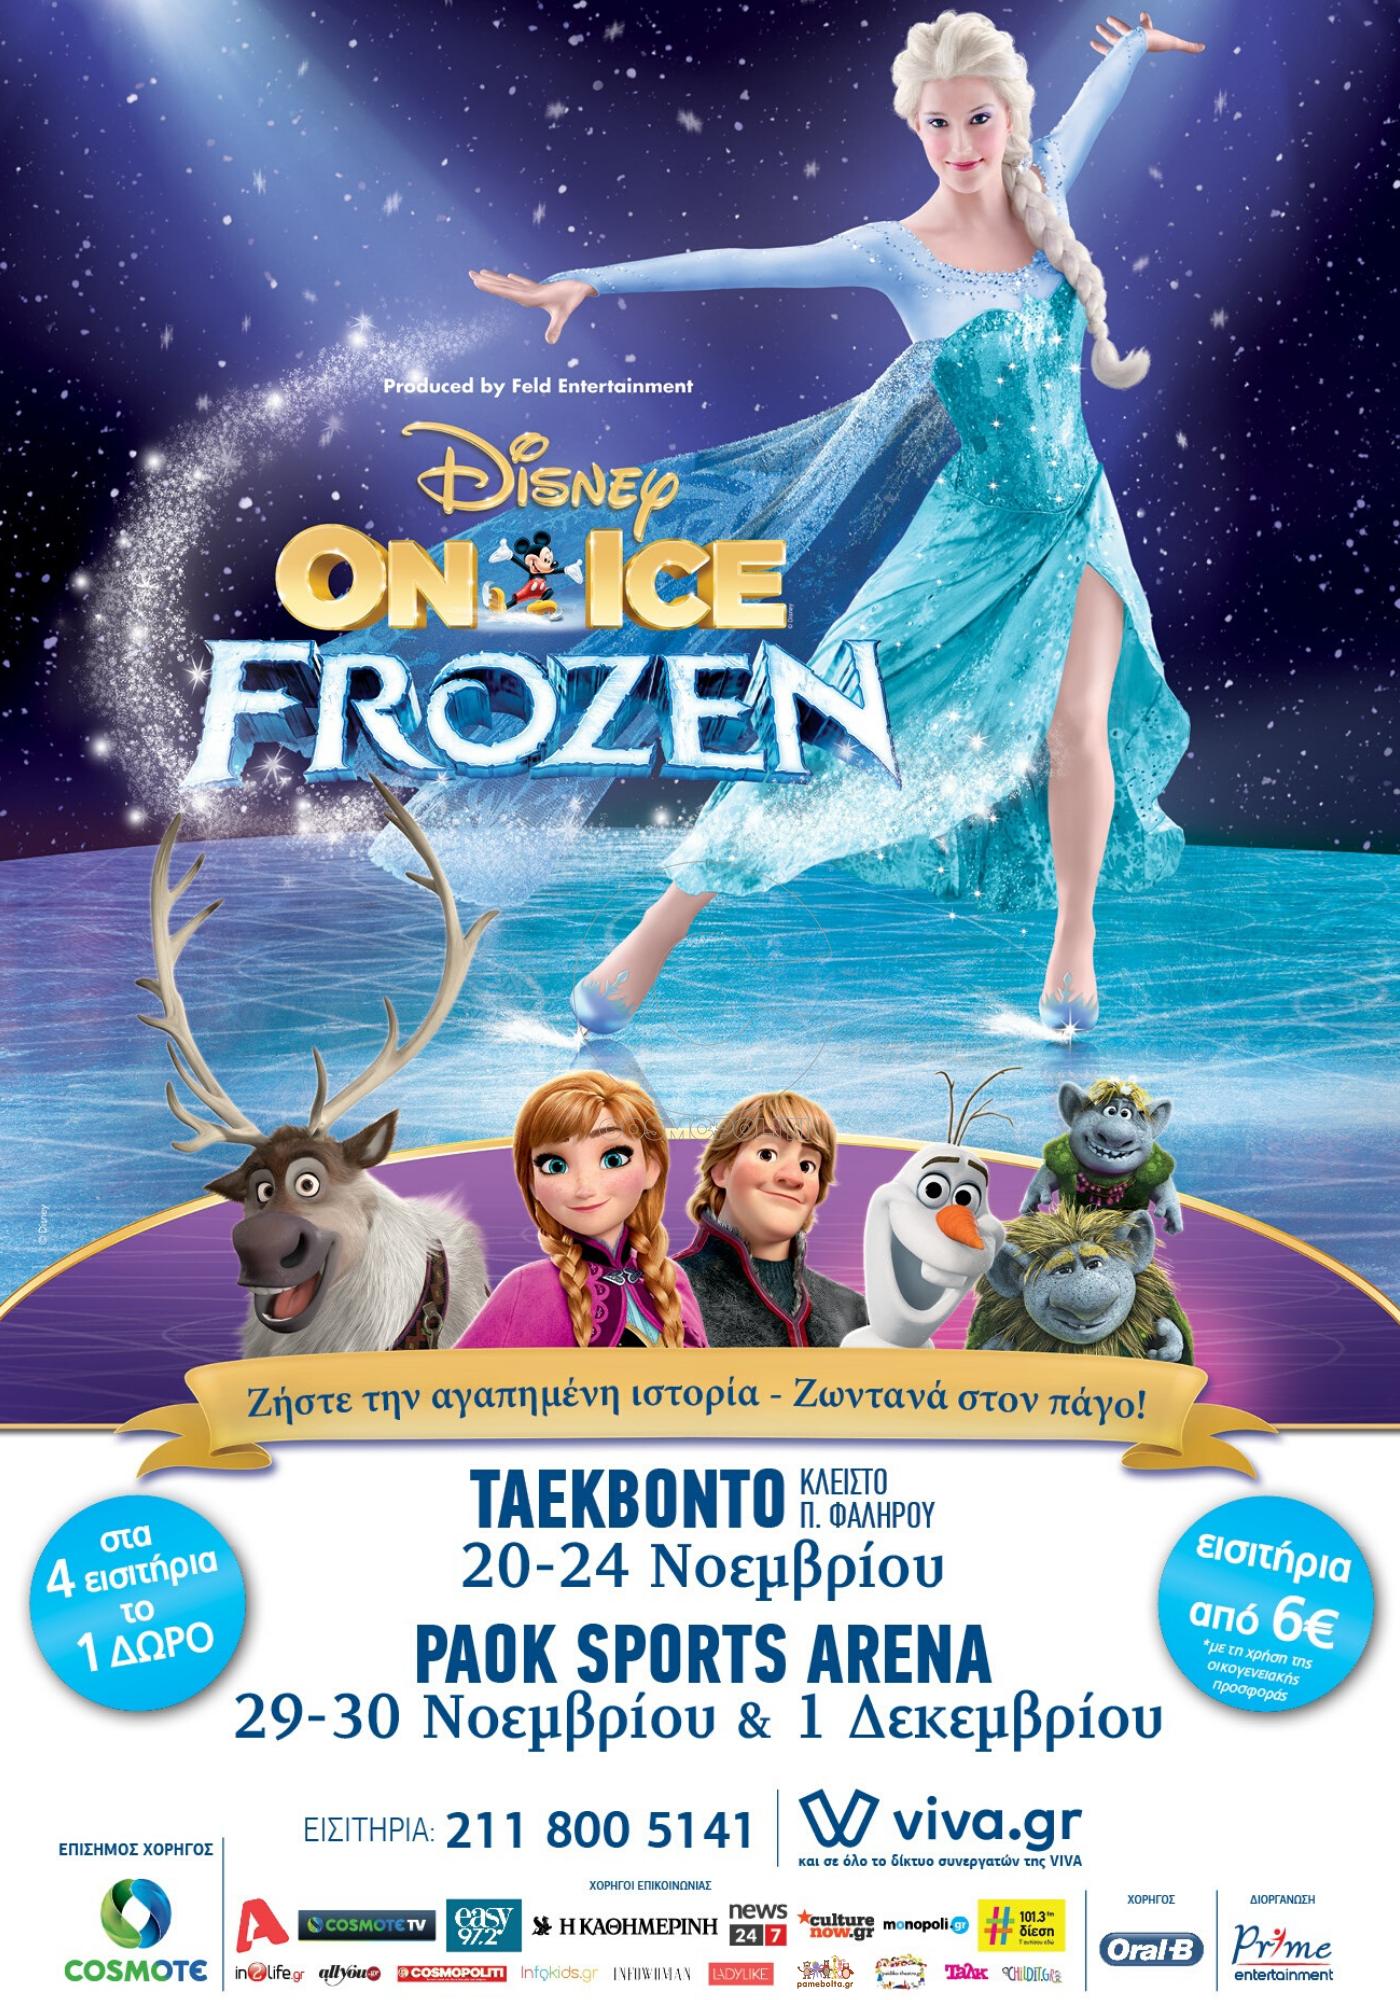 Disney on Ice Frozen - Poster